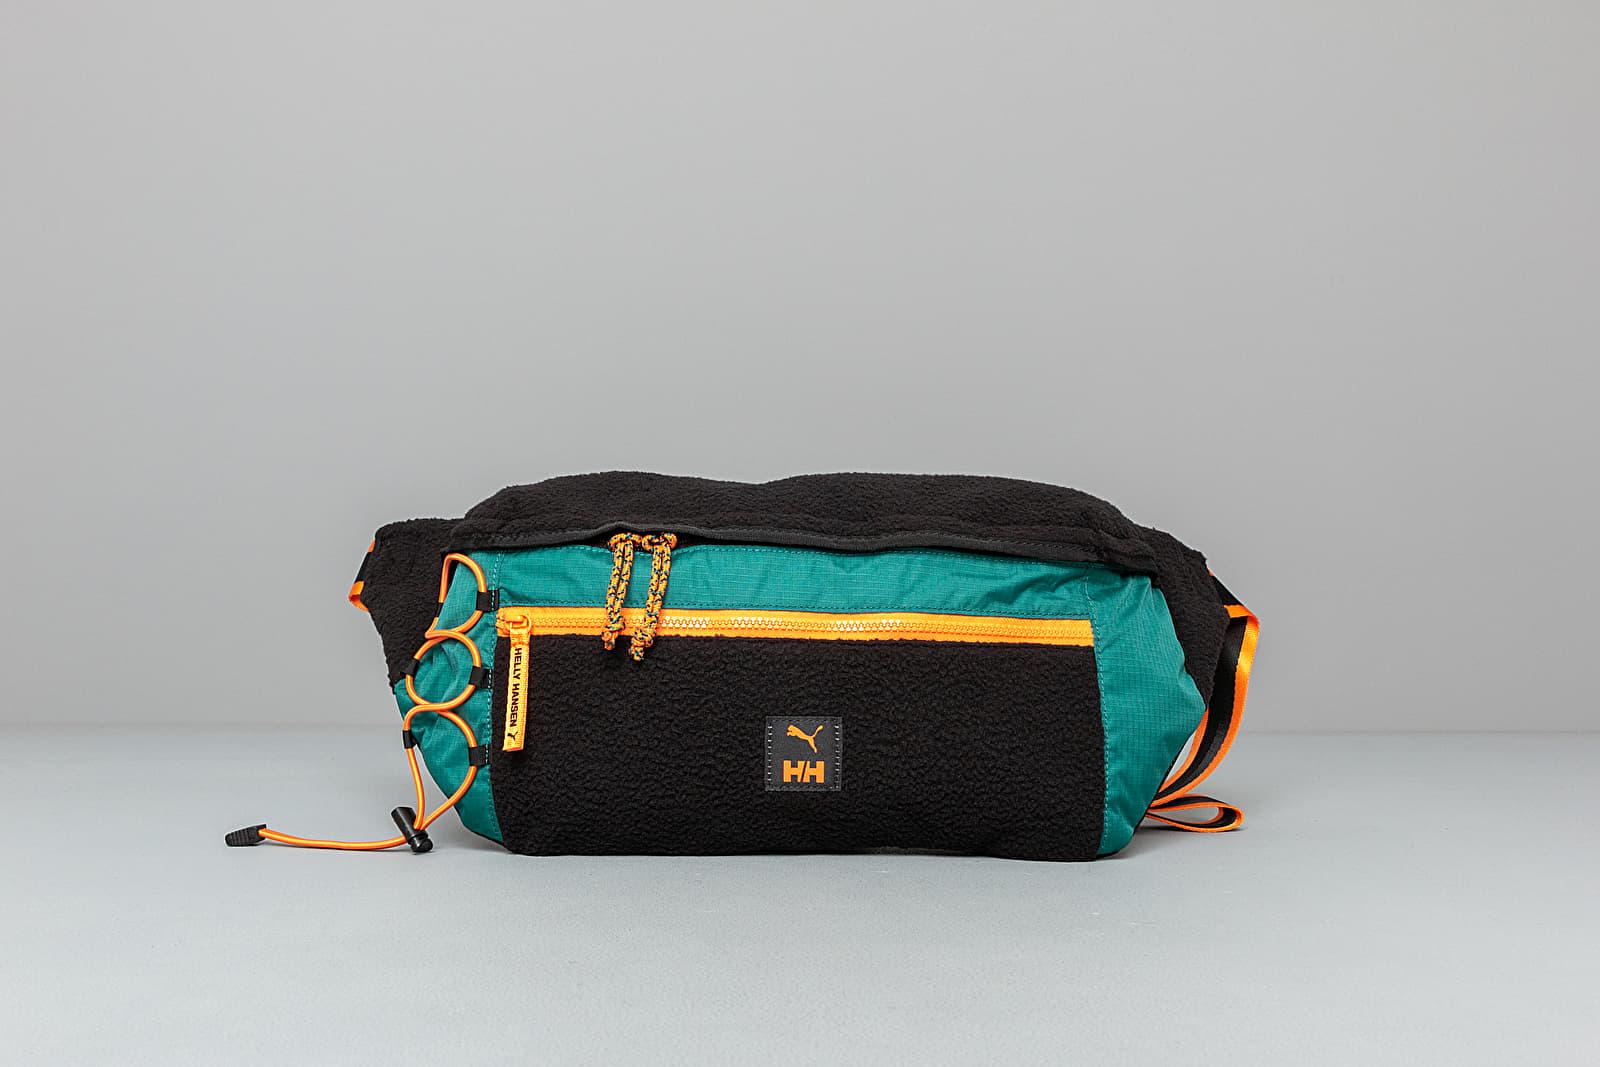 Puma x Helly Hansen Oversized Waistbag